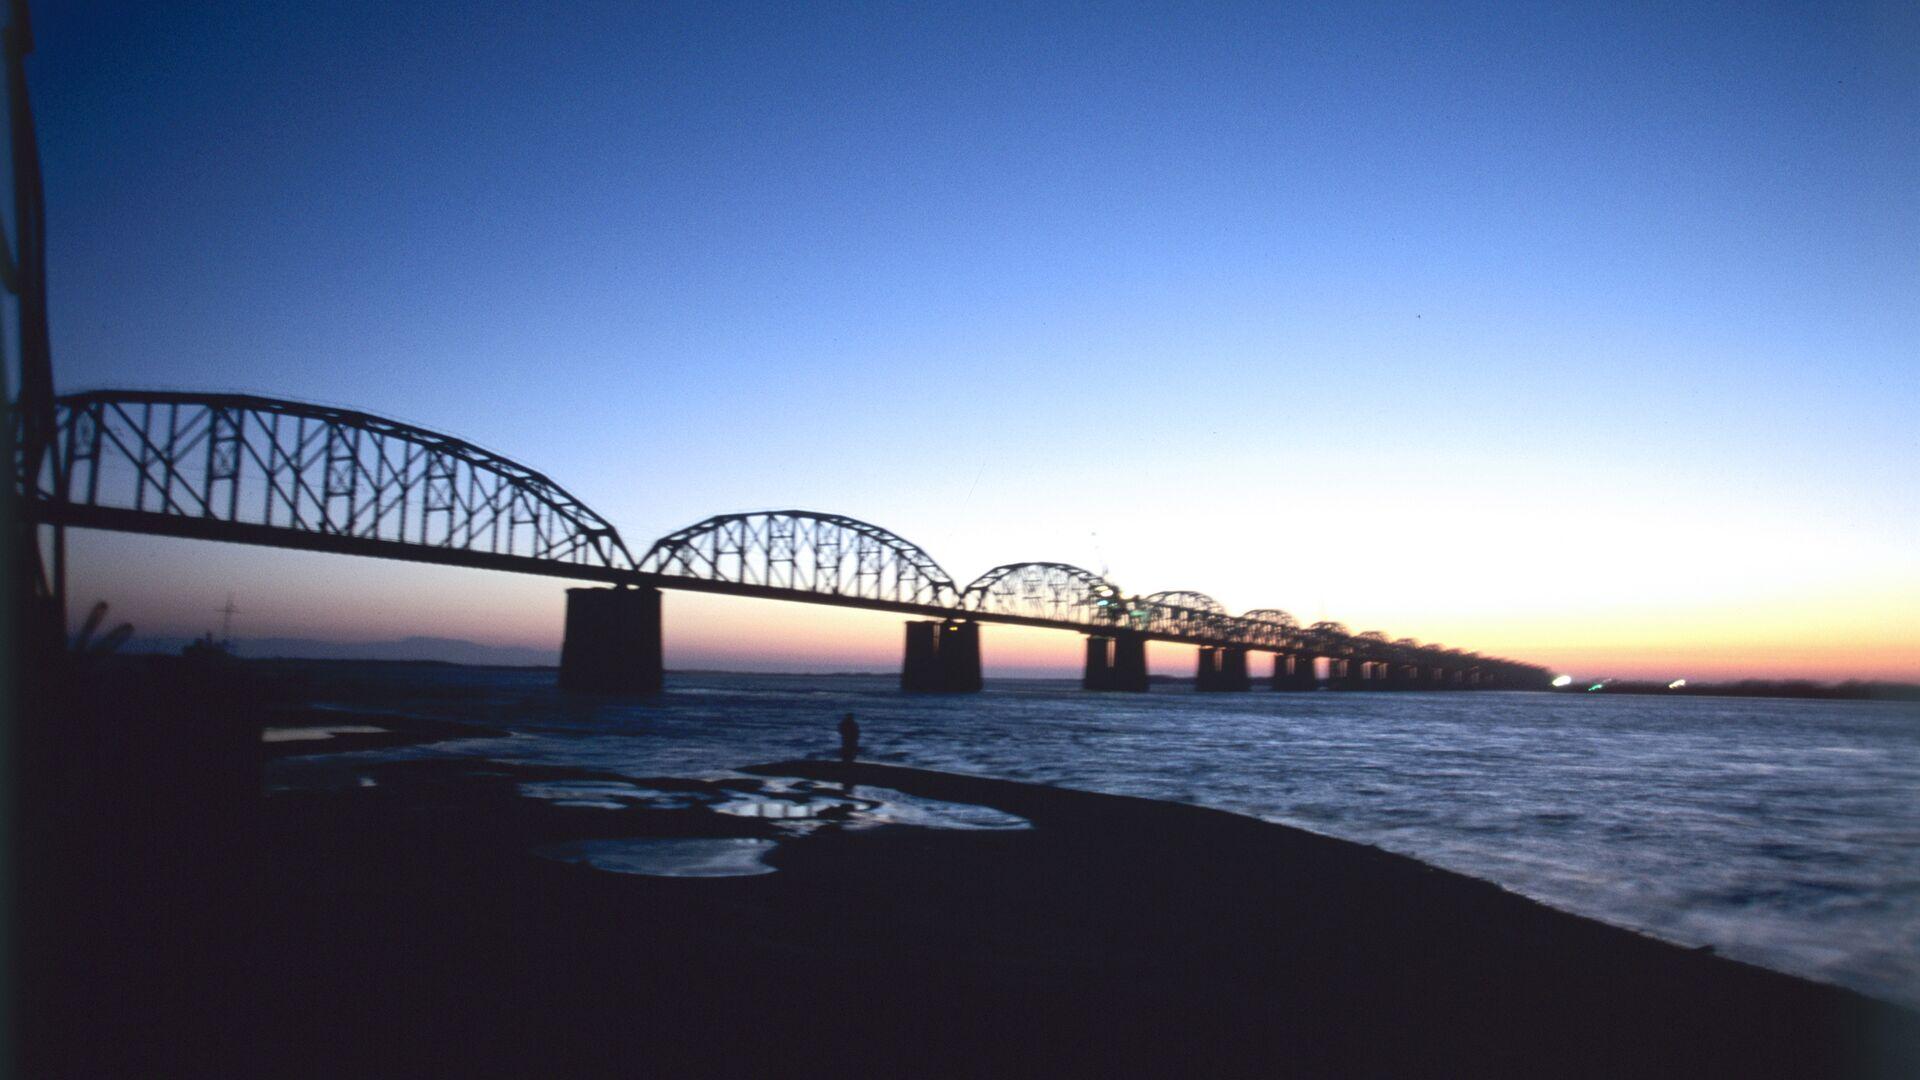 Мост через реку Амур - РИА Новости, 1920, 24.09.2021